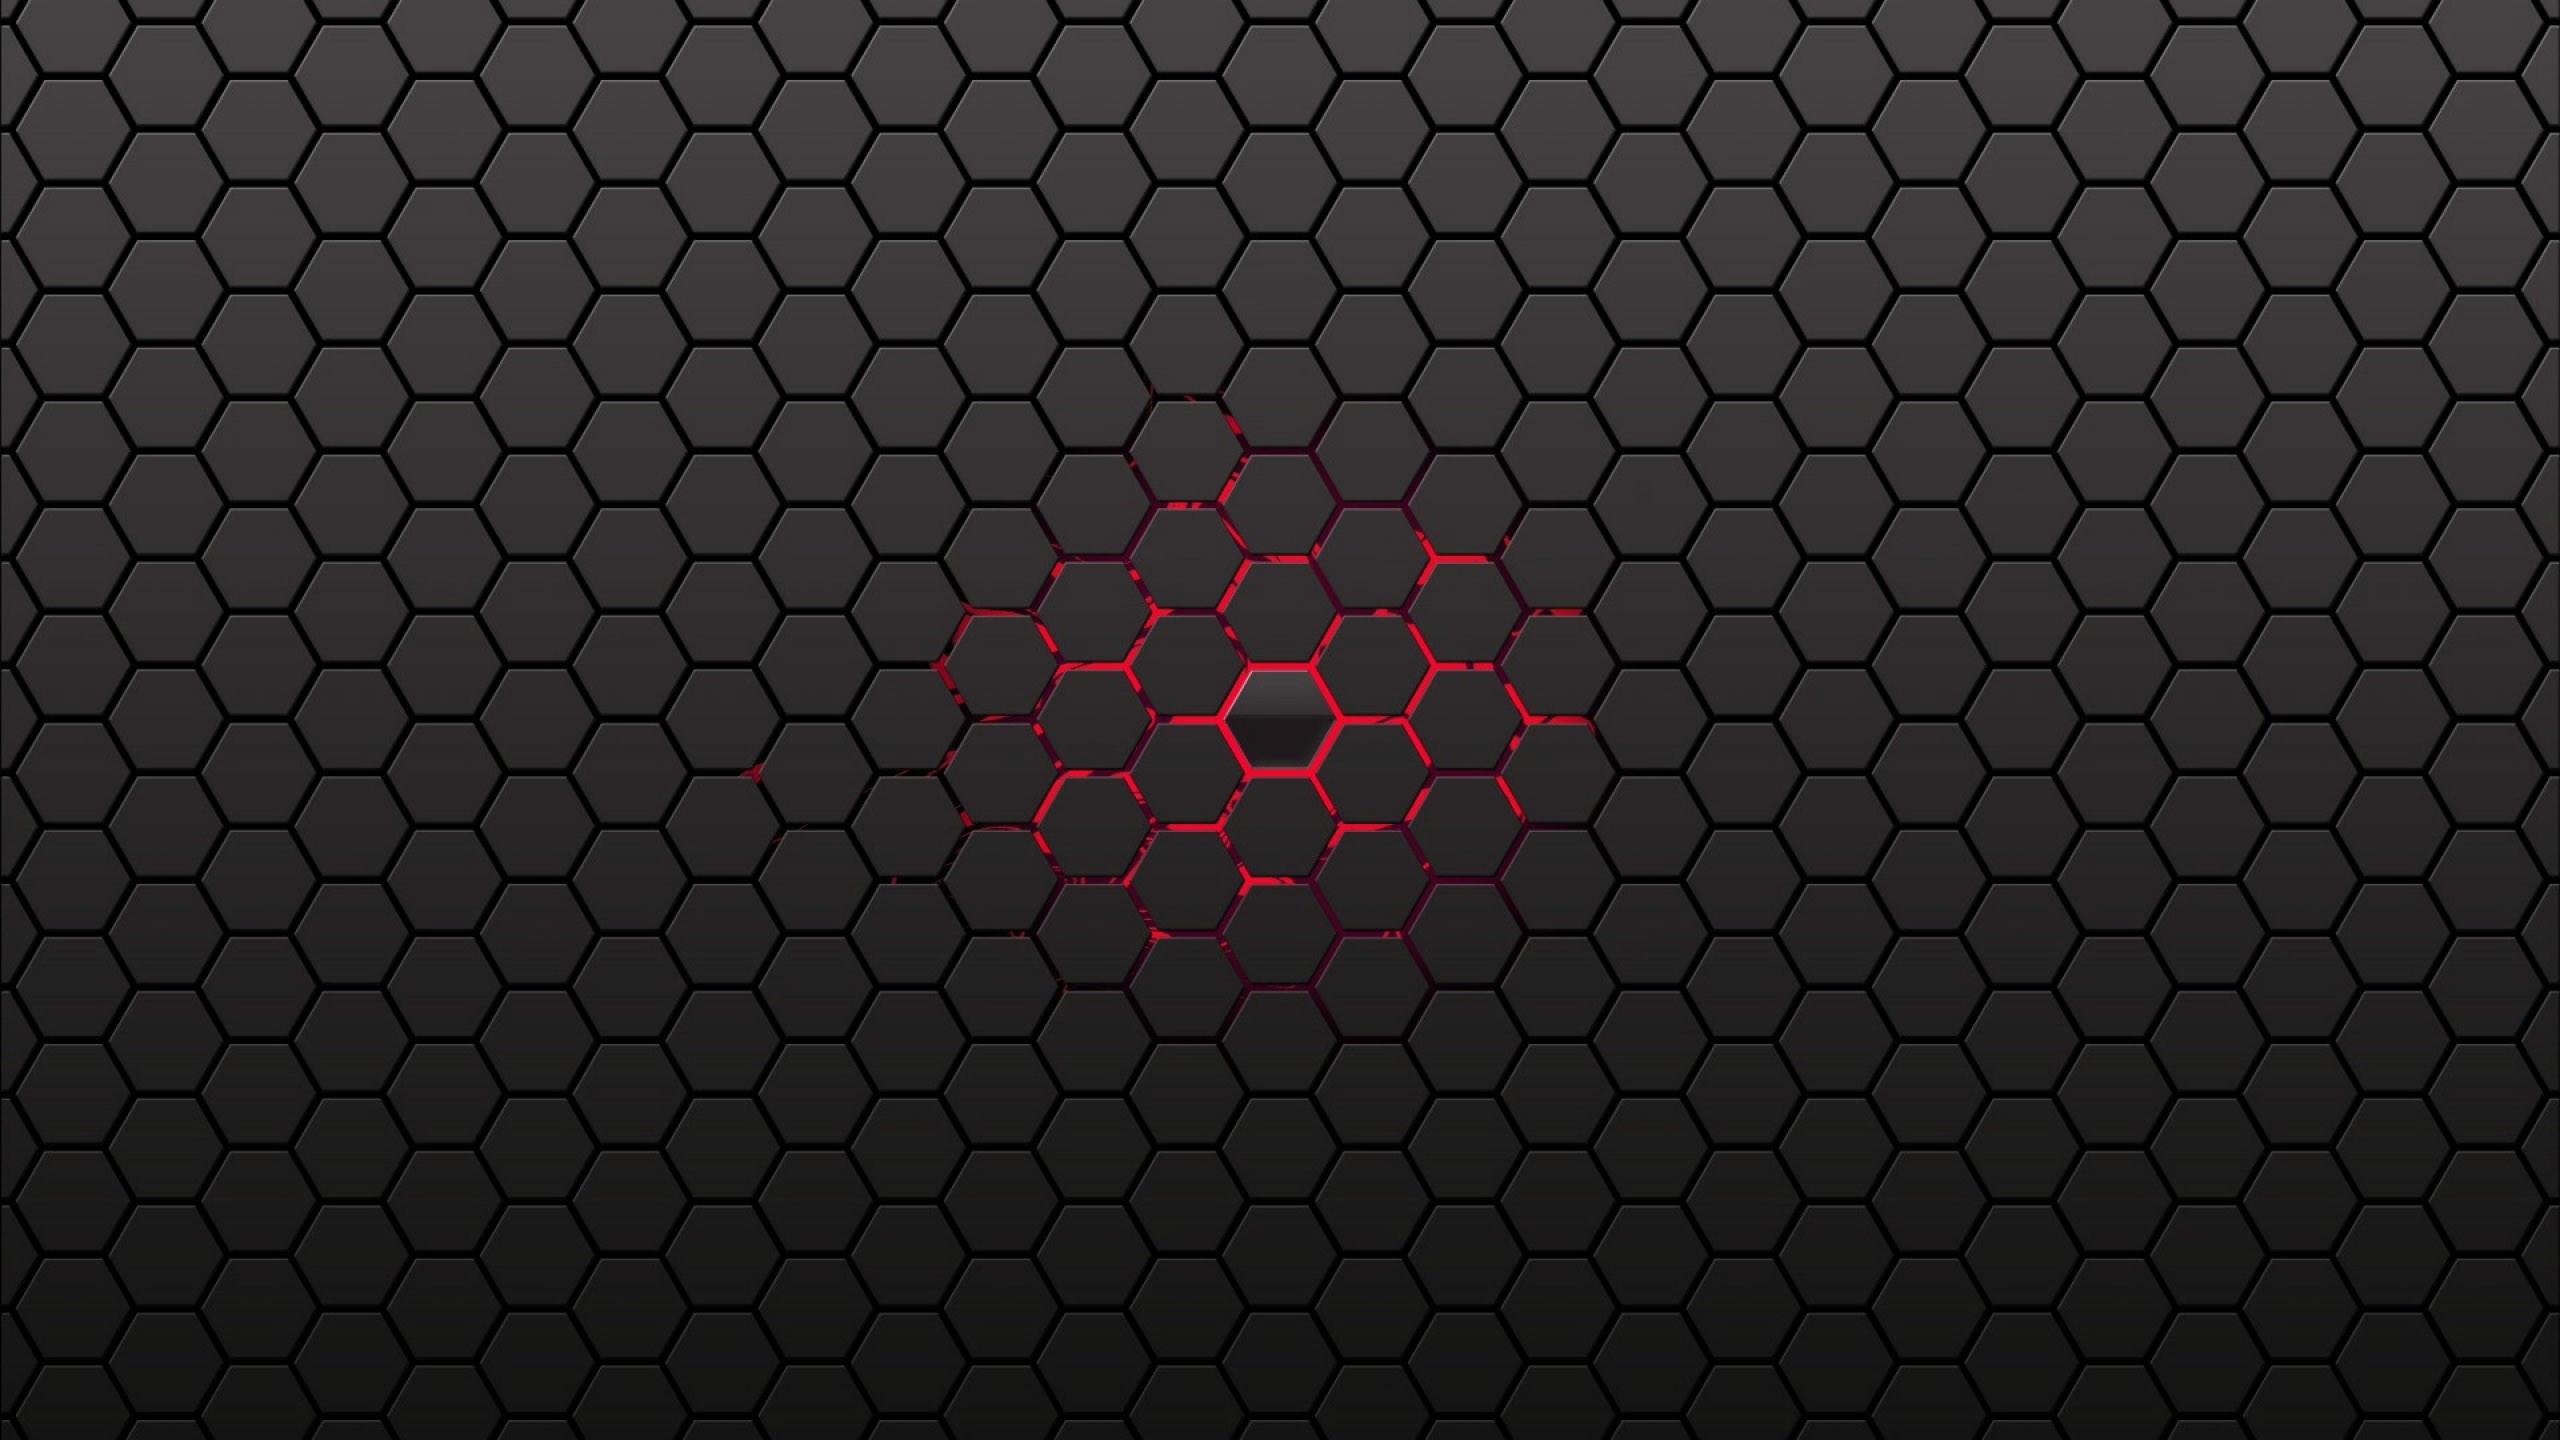 Dark Abstract Wallpapers HD 1920×1080 Black Abstract Wallpaper (65  Wallpapers) | Adorable